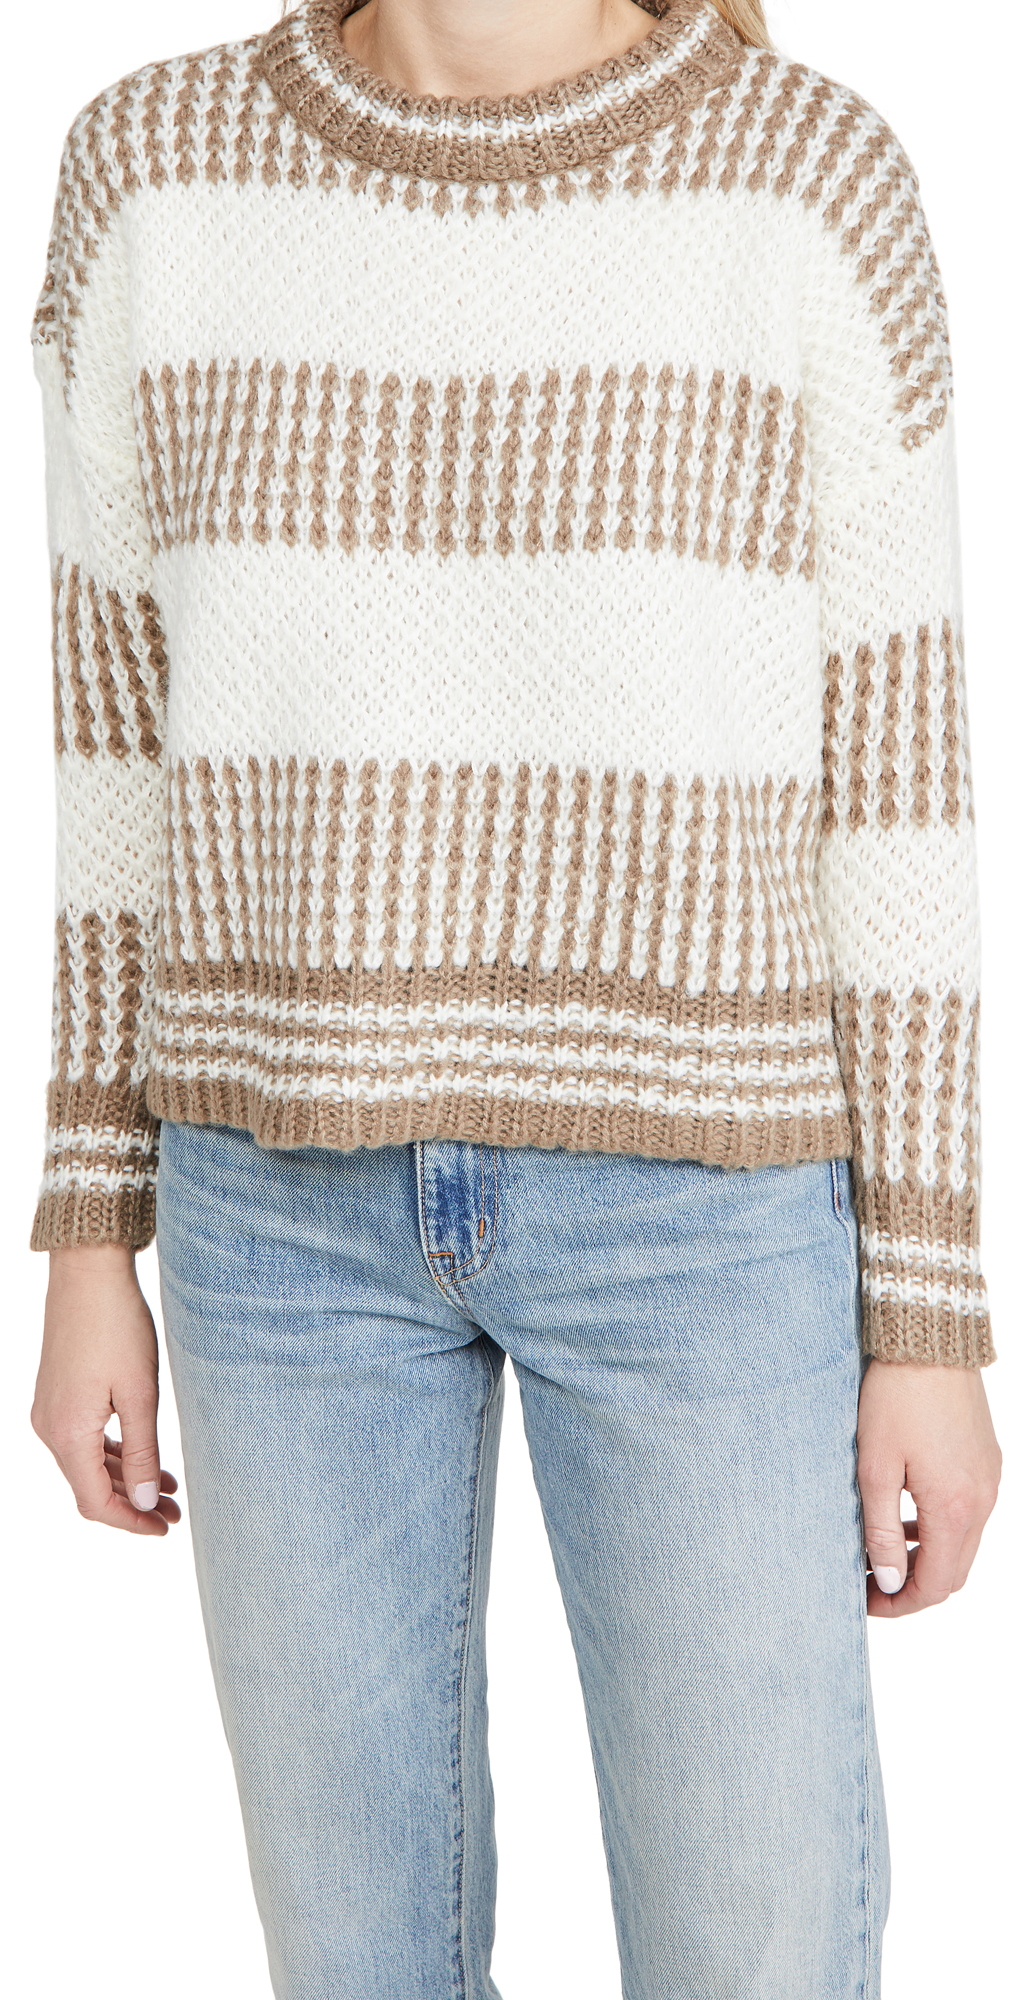 MINKPINK Highlands Knit Sweater